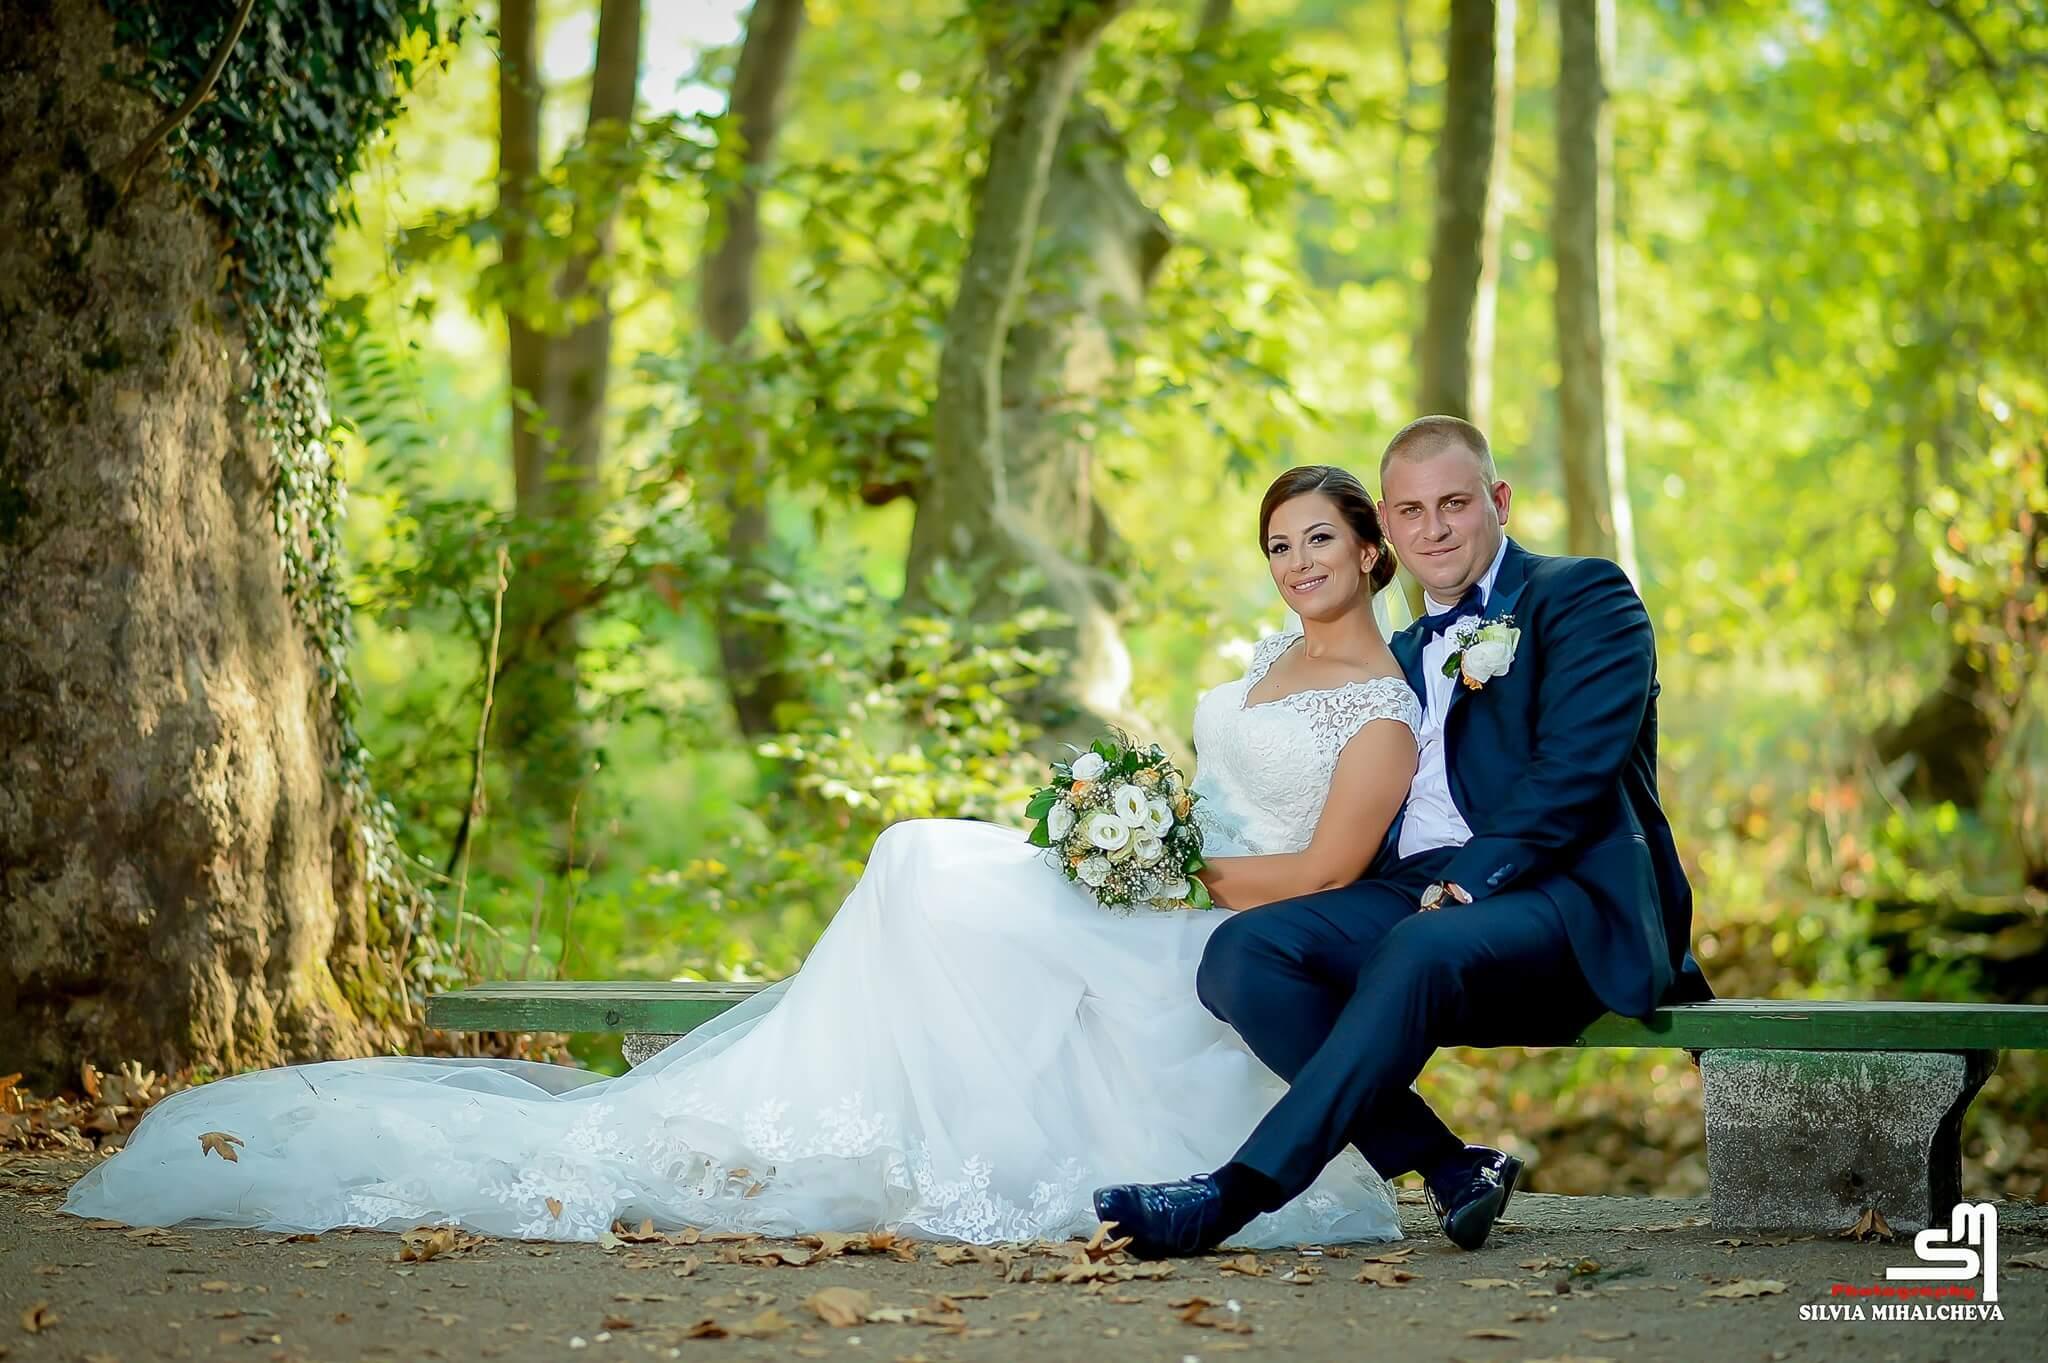 Сватбена фотограф - Станоев Ст��дио